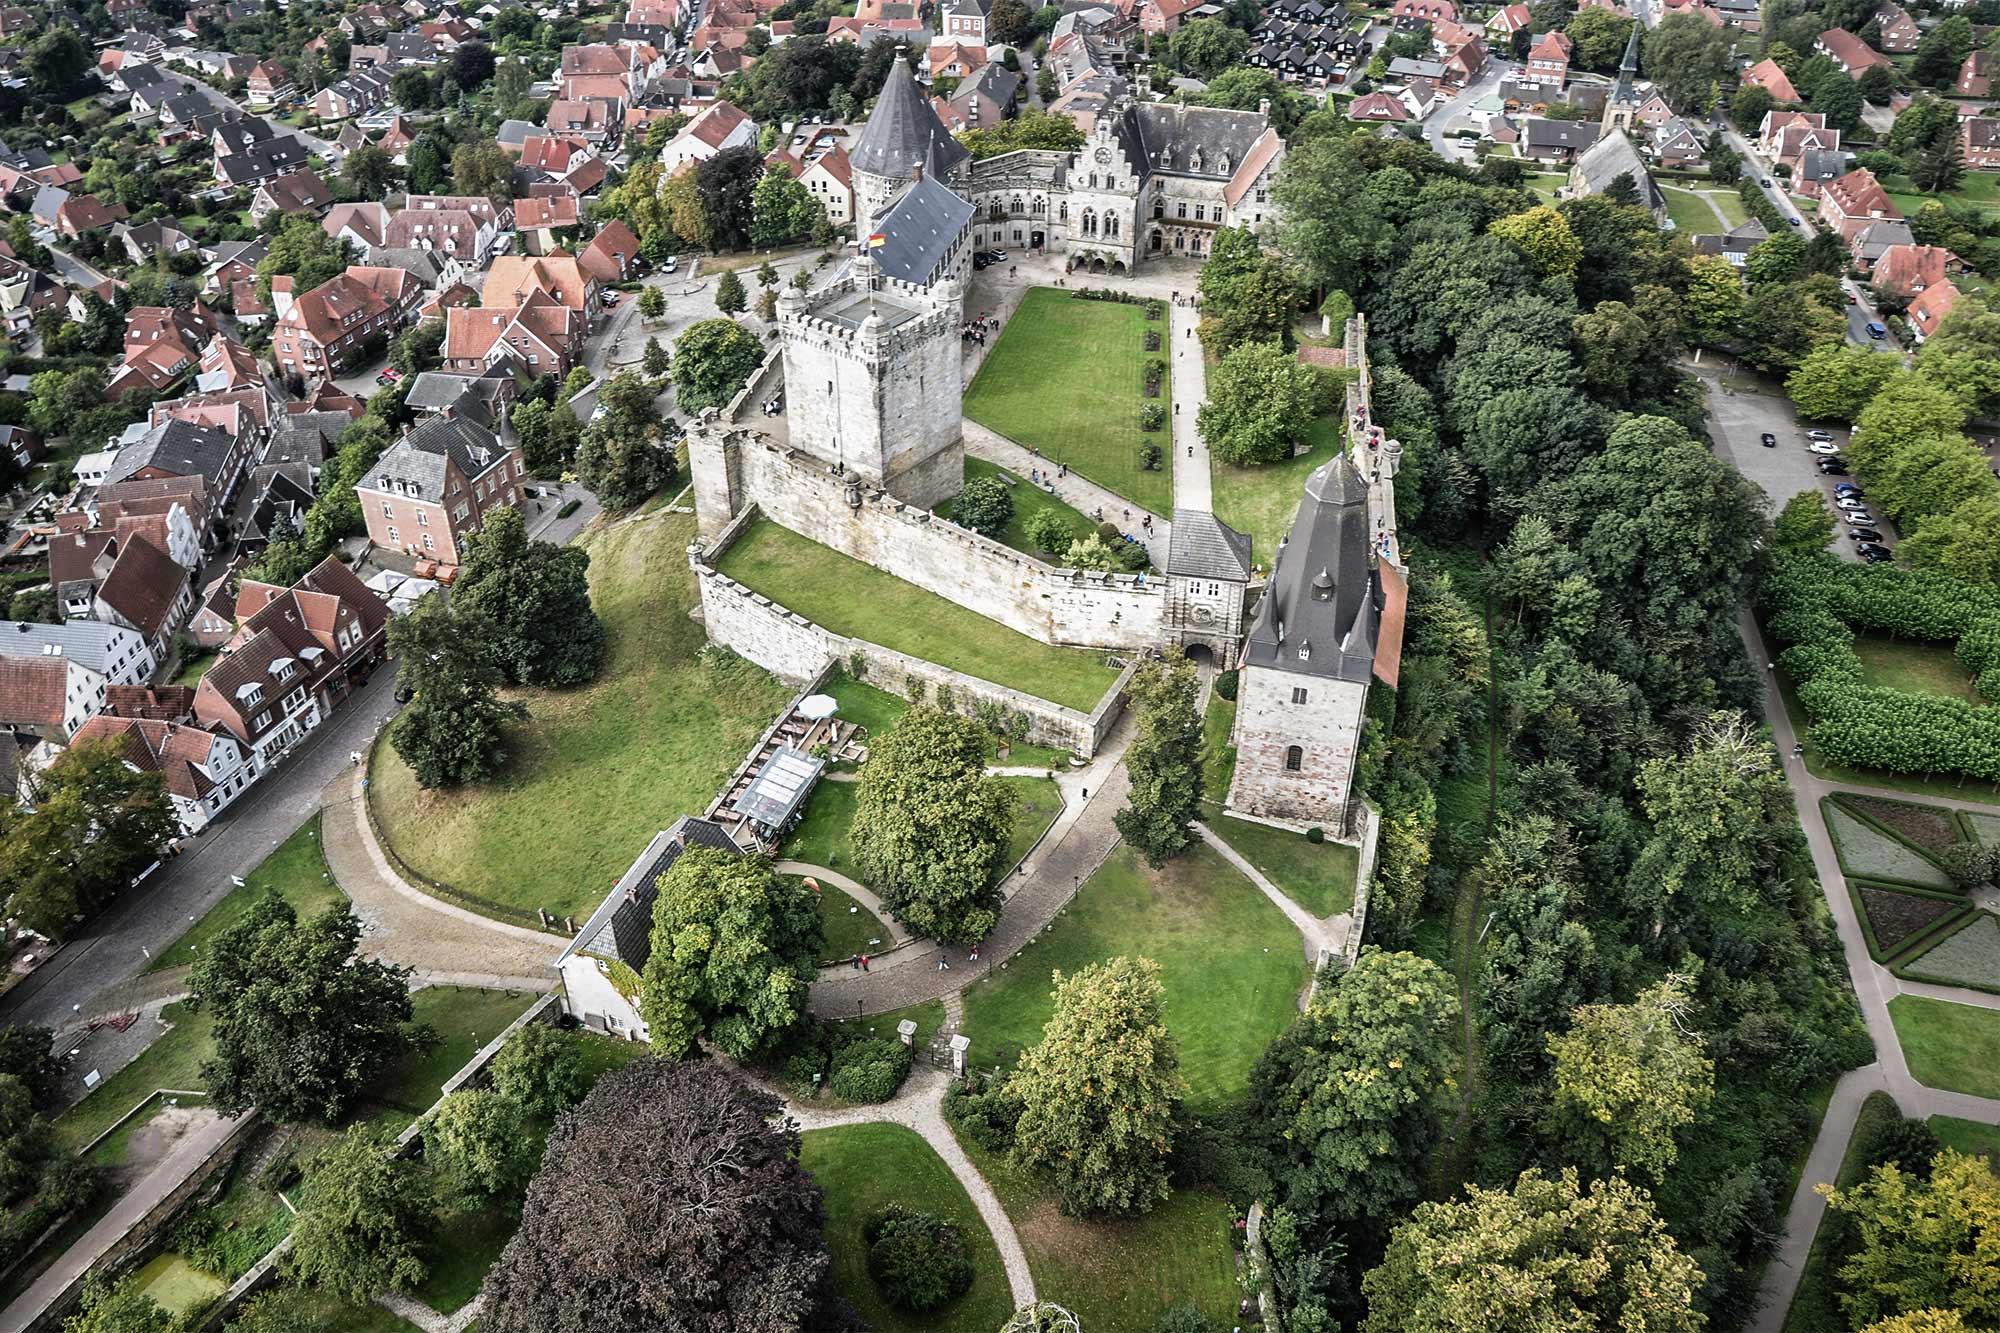 Aerial view of Bentheim Castle